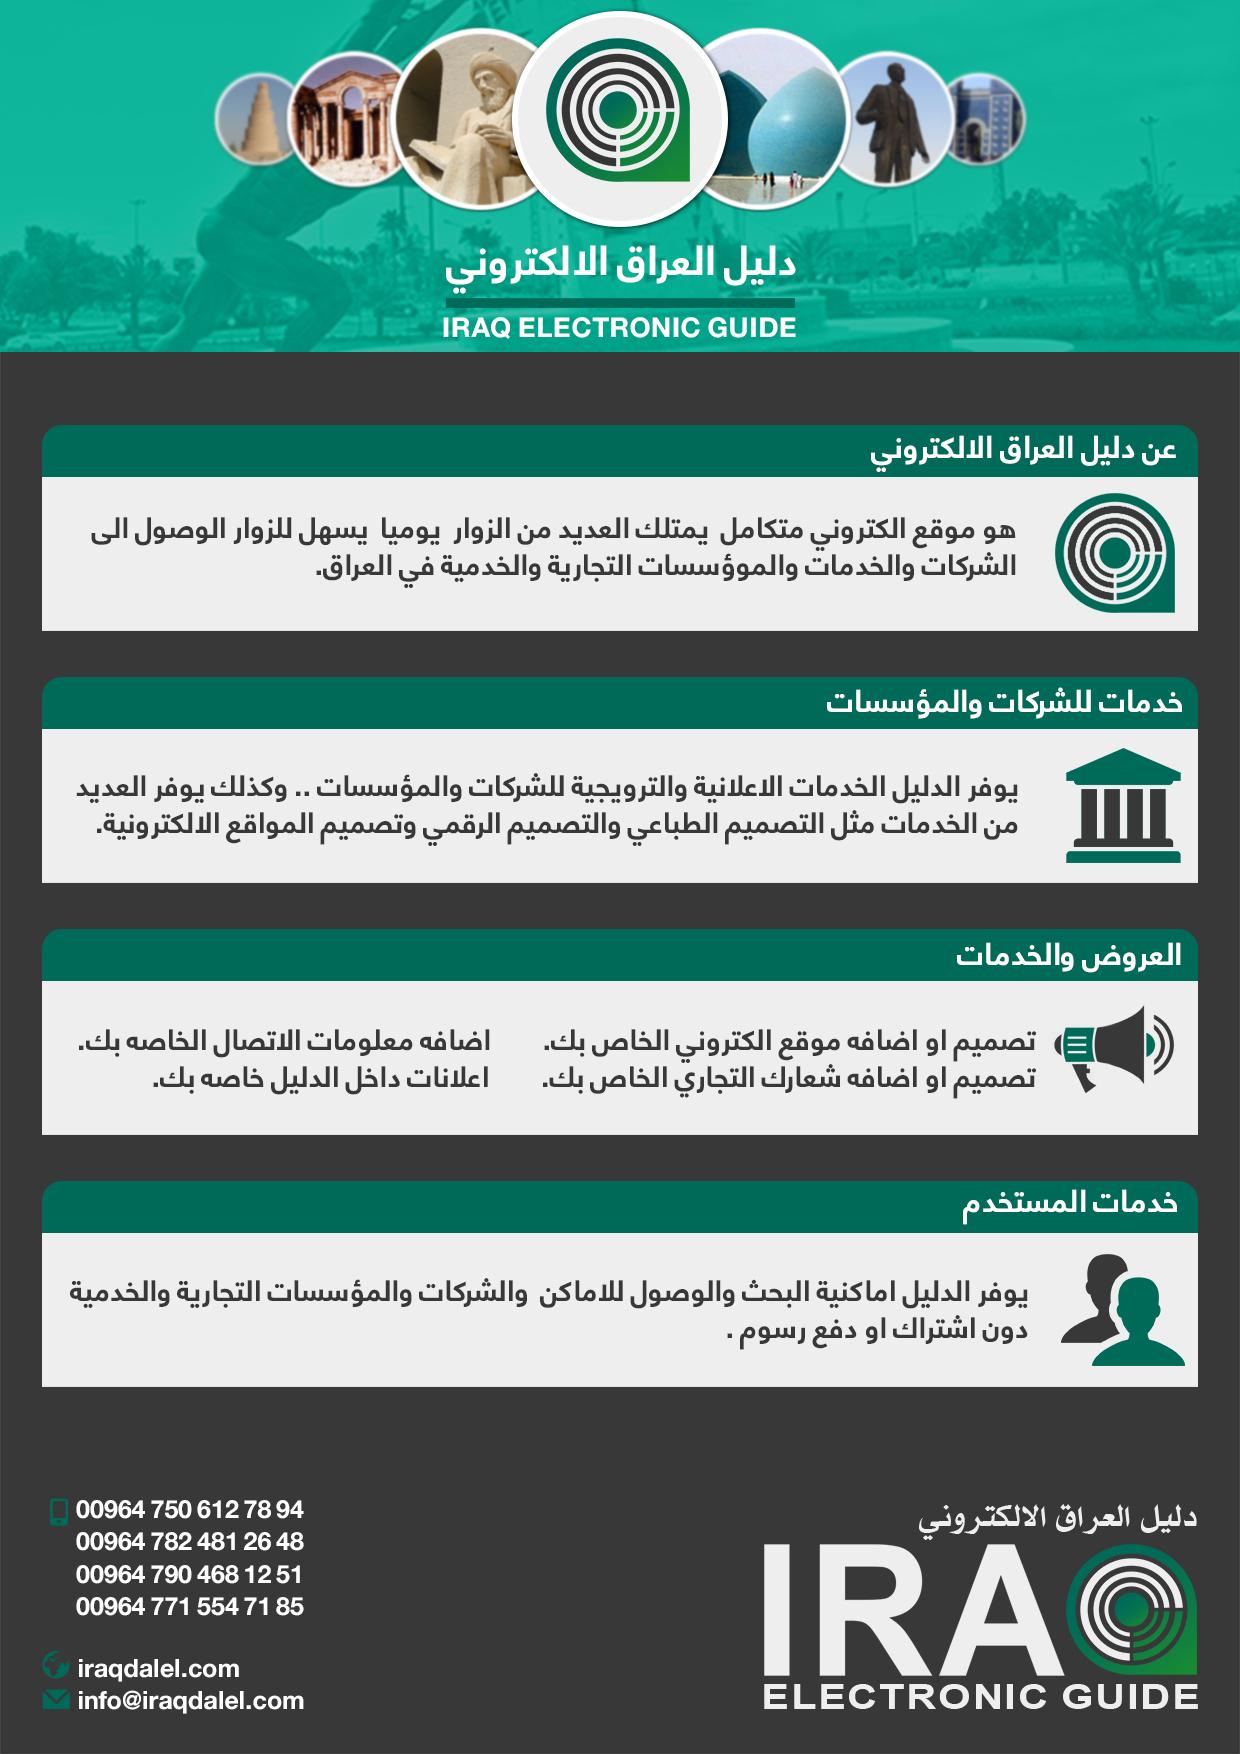 بروشور دليل العراق الالكتروني